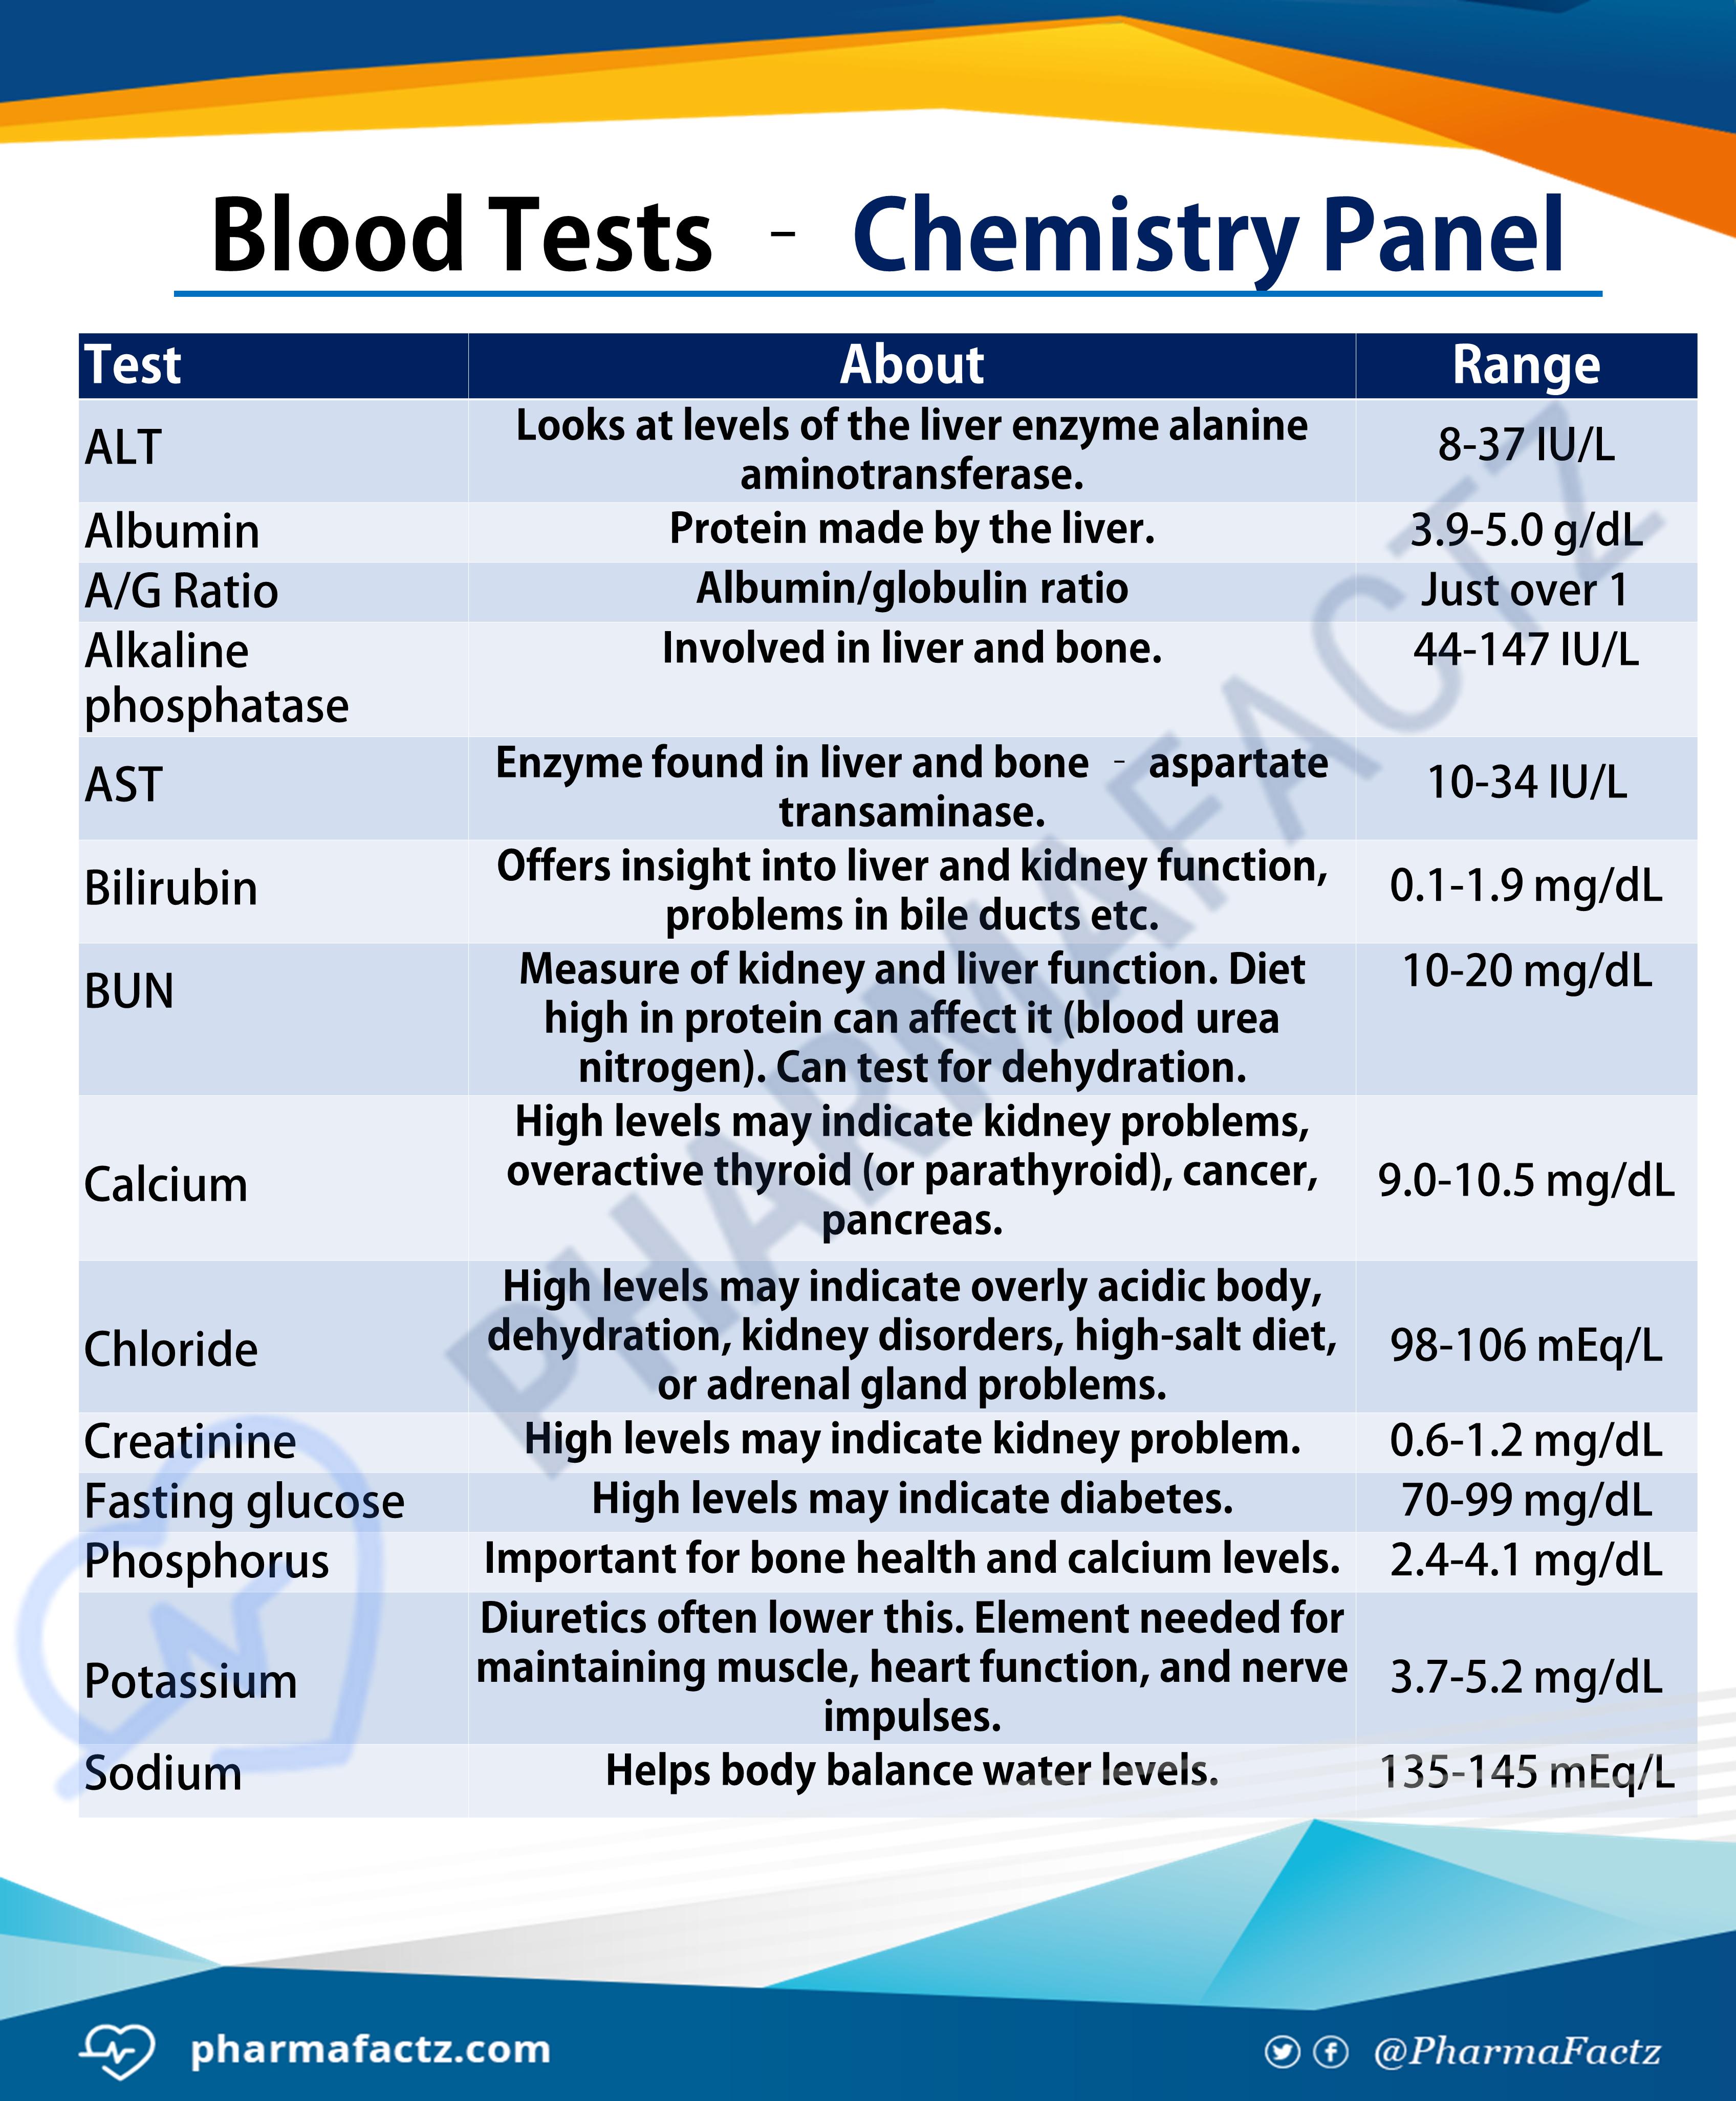 Blood Tests - Chemistry Panel